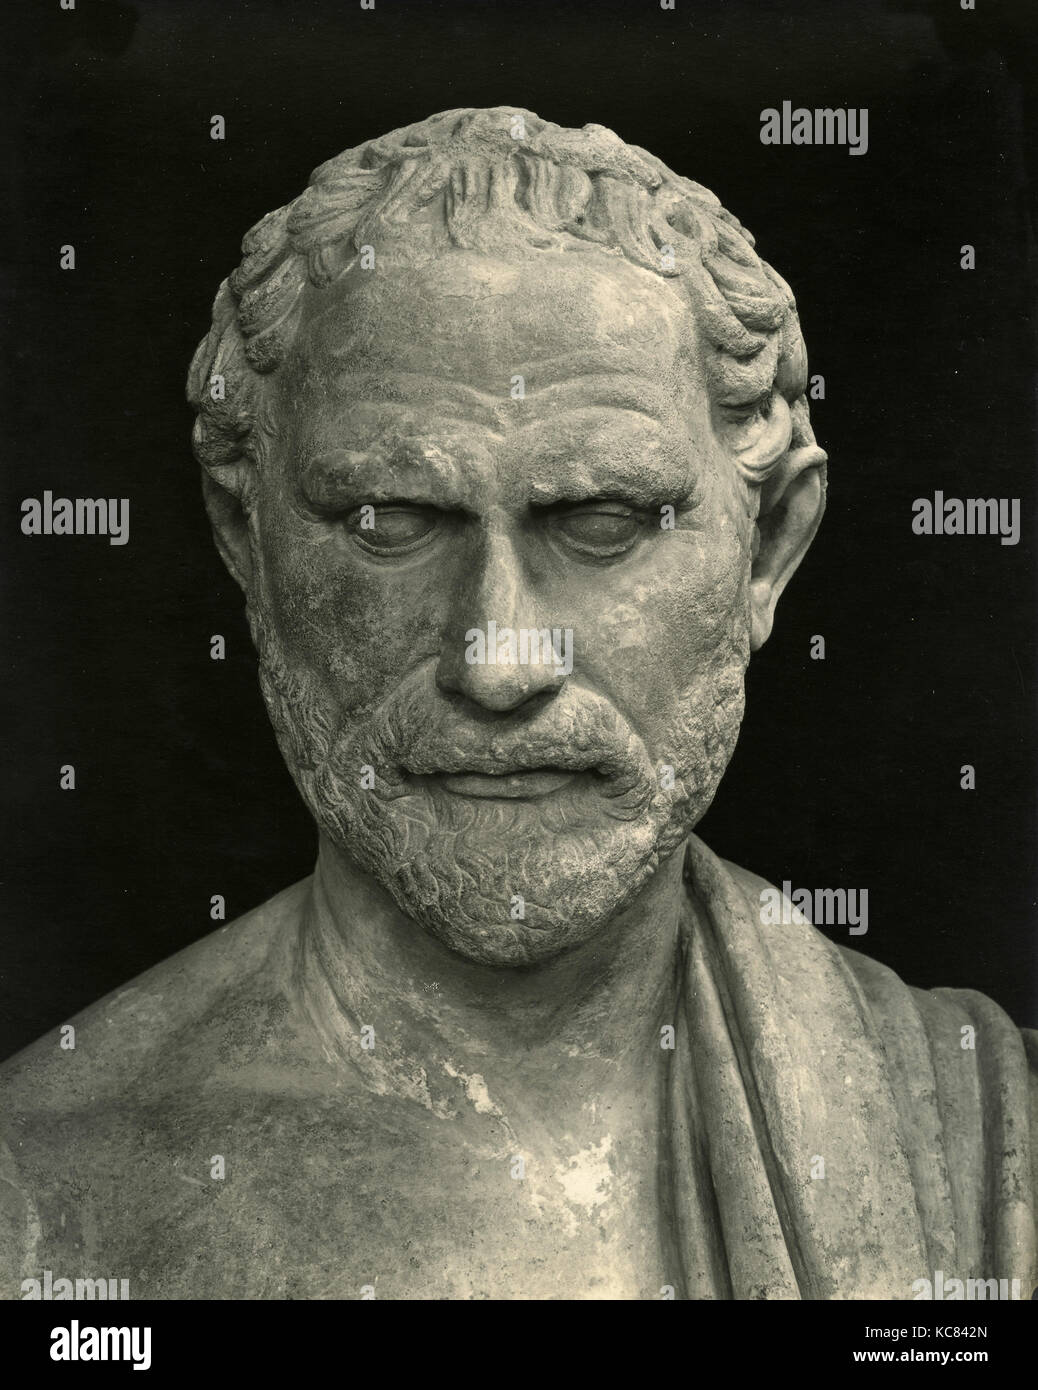 Greek statesman Demosthenes, Marble statue - Stock Image